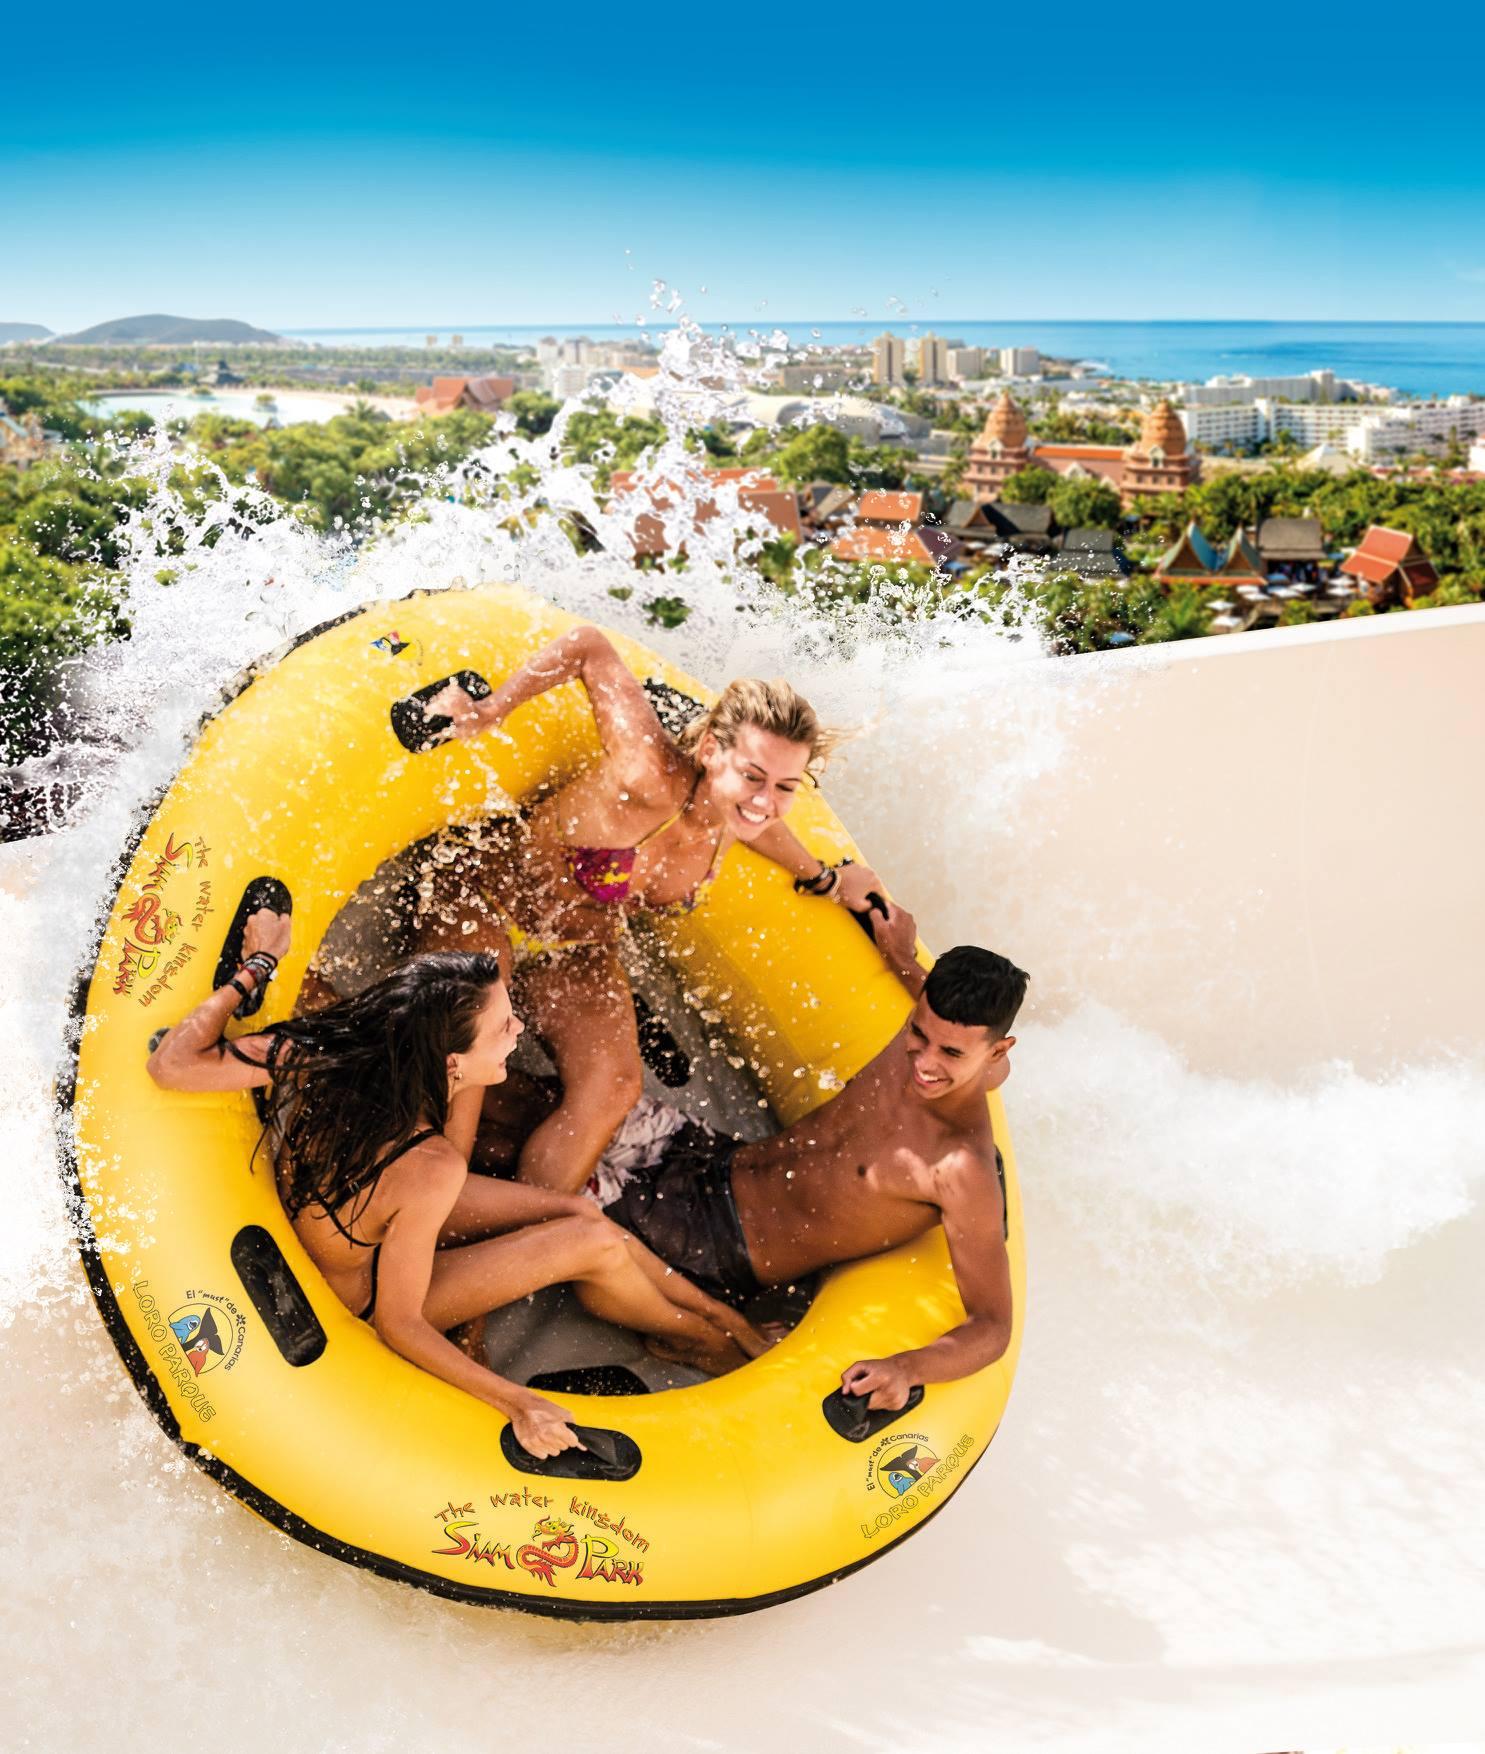 villa-mandi-hotel-tenerife-actividades-planes-2019